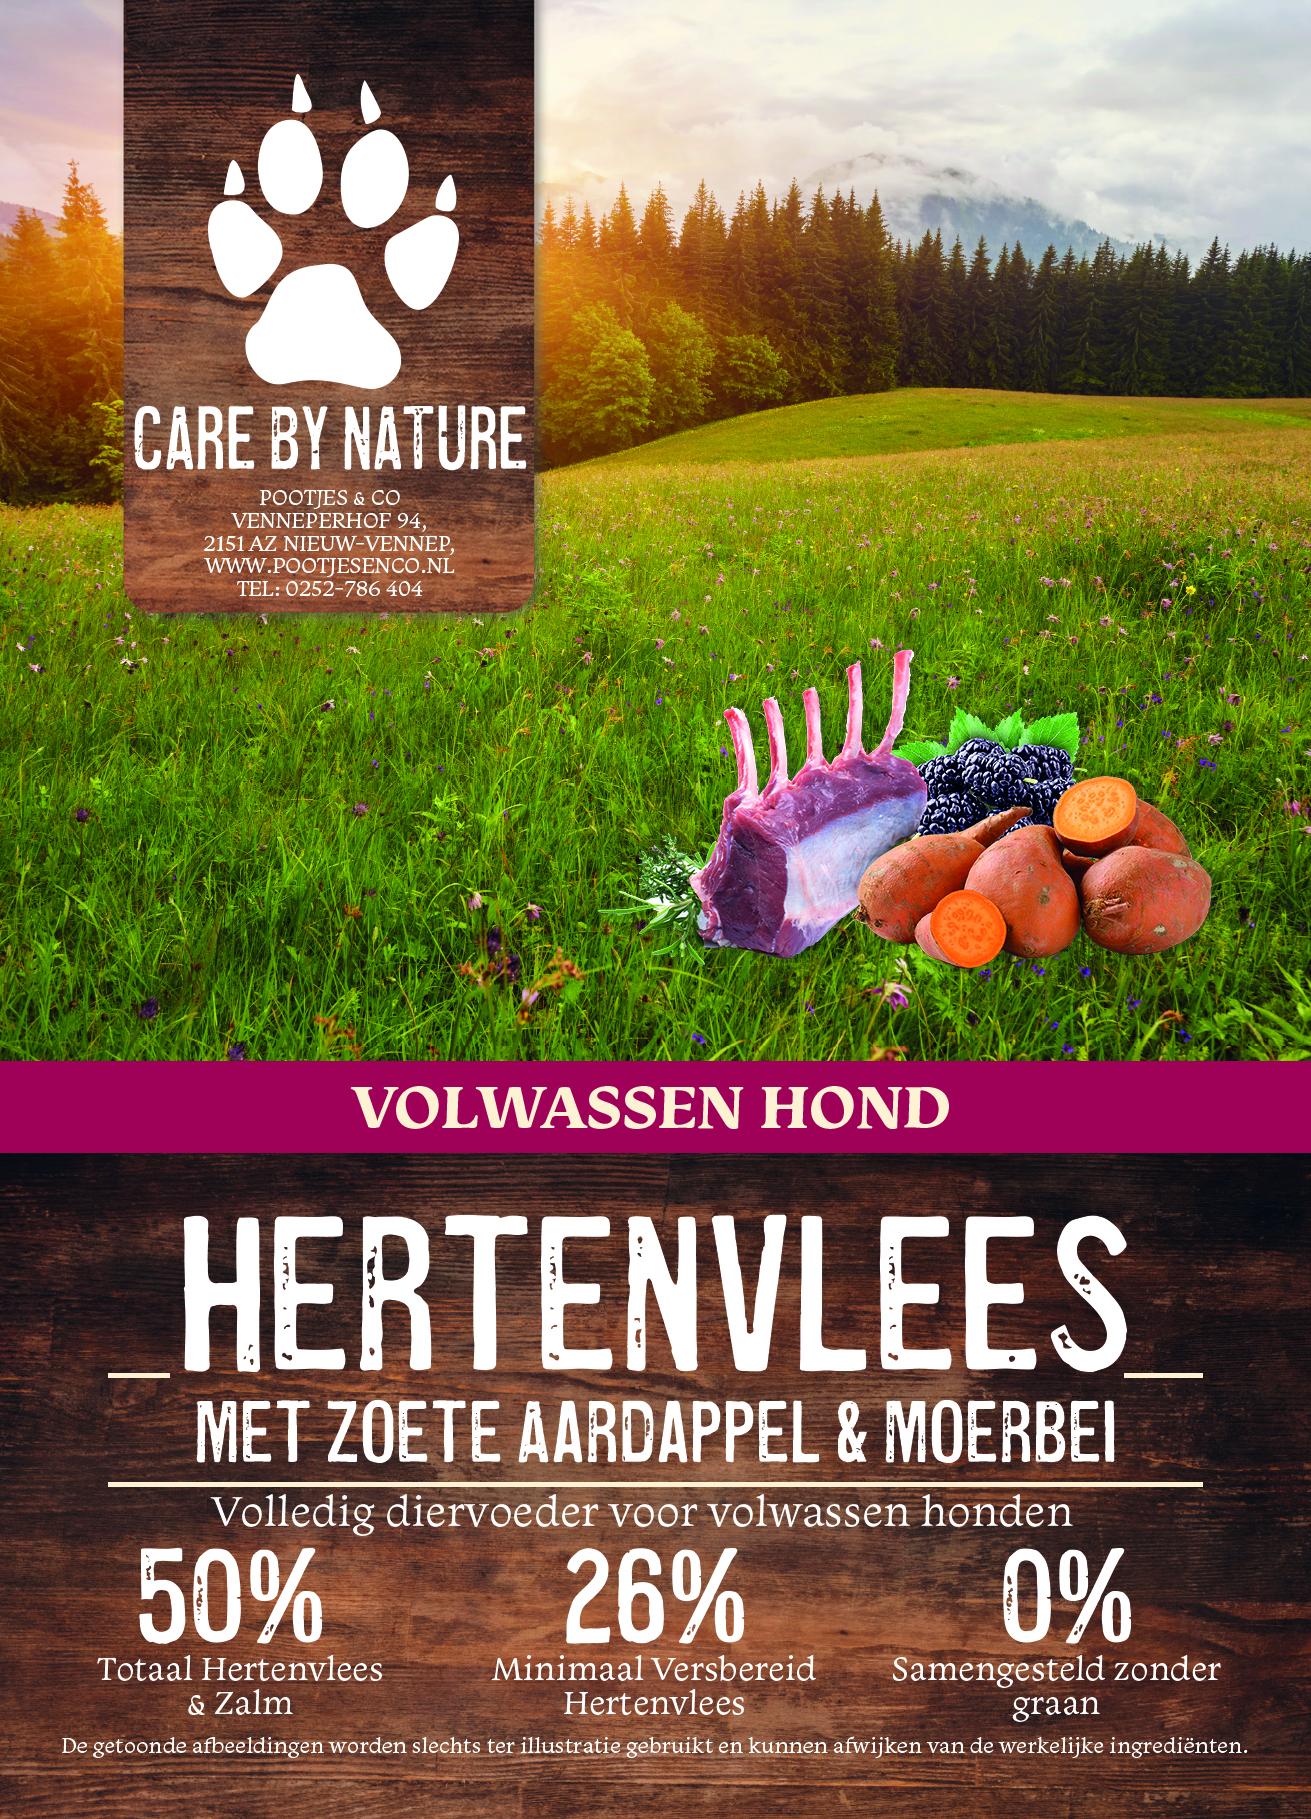 Care by Nature hondenvoedingen